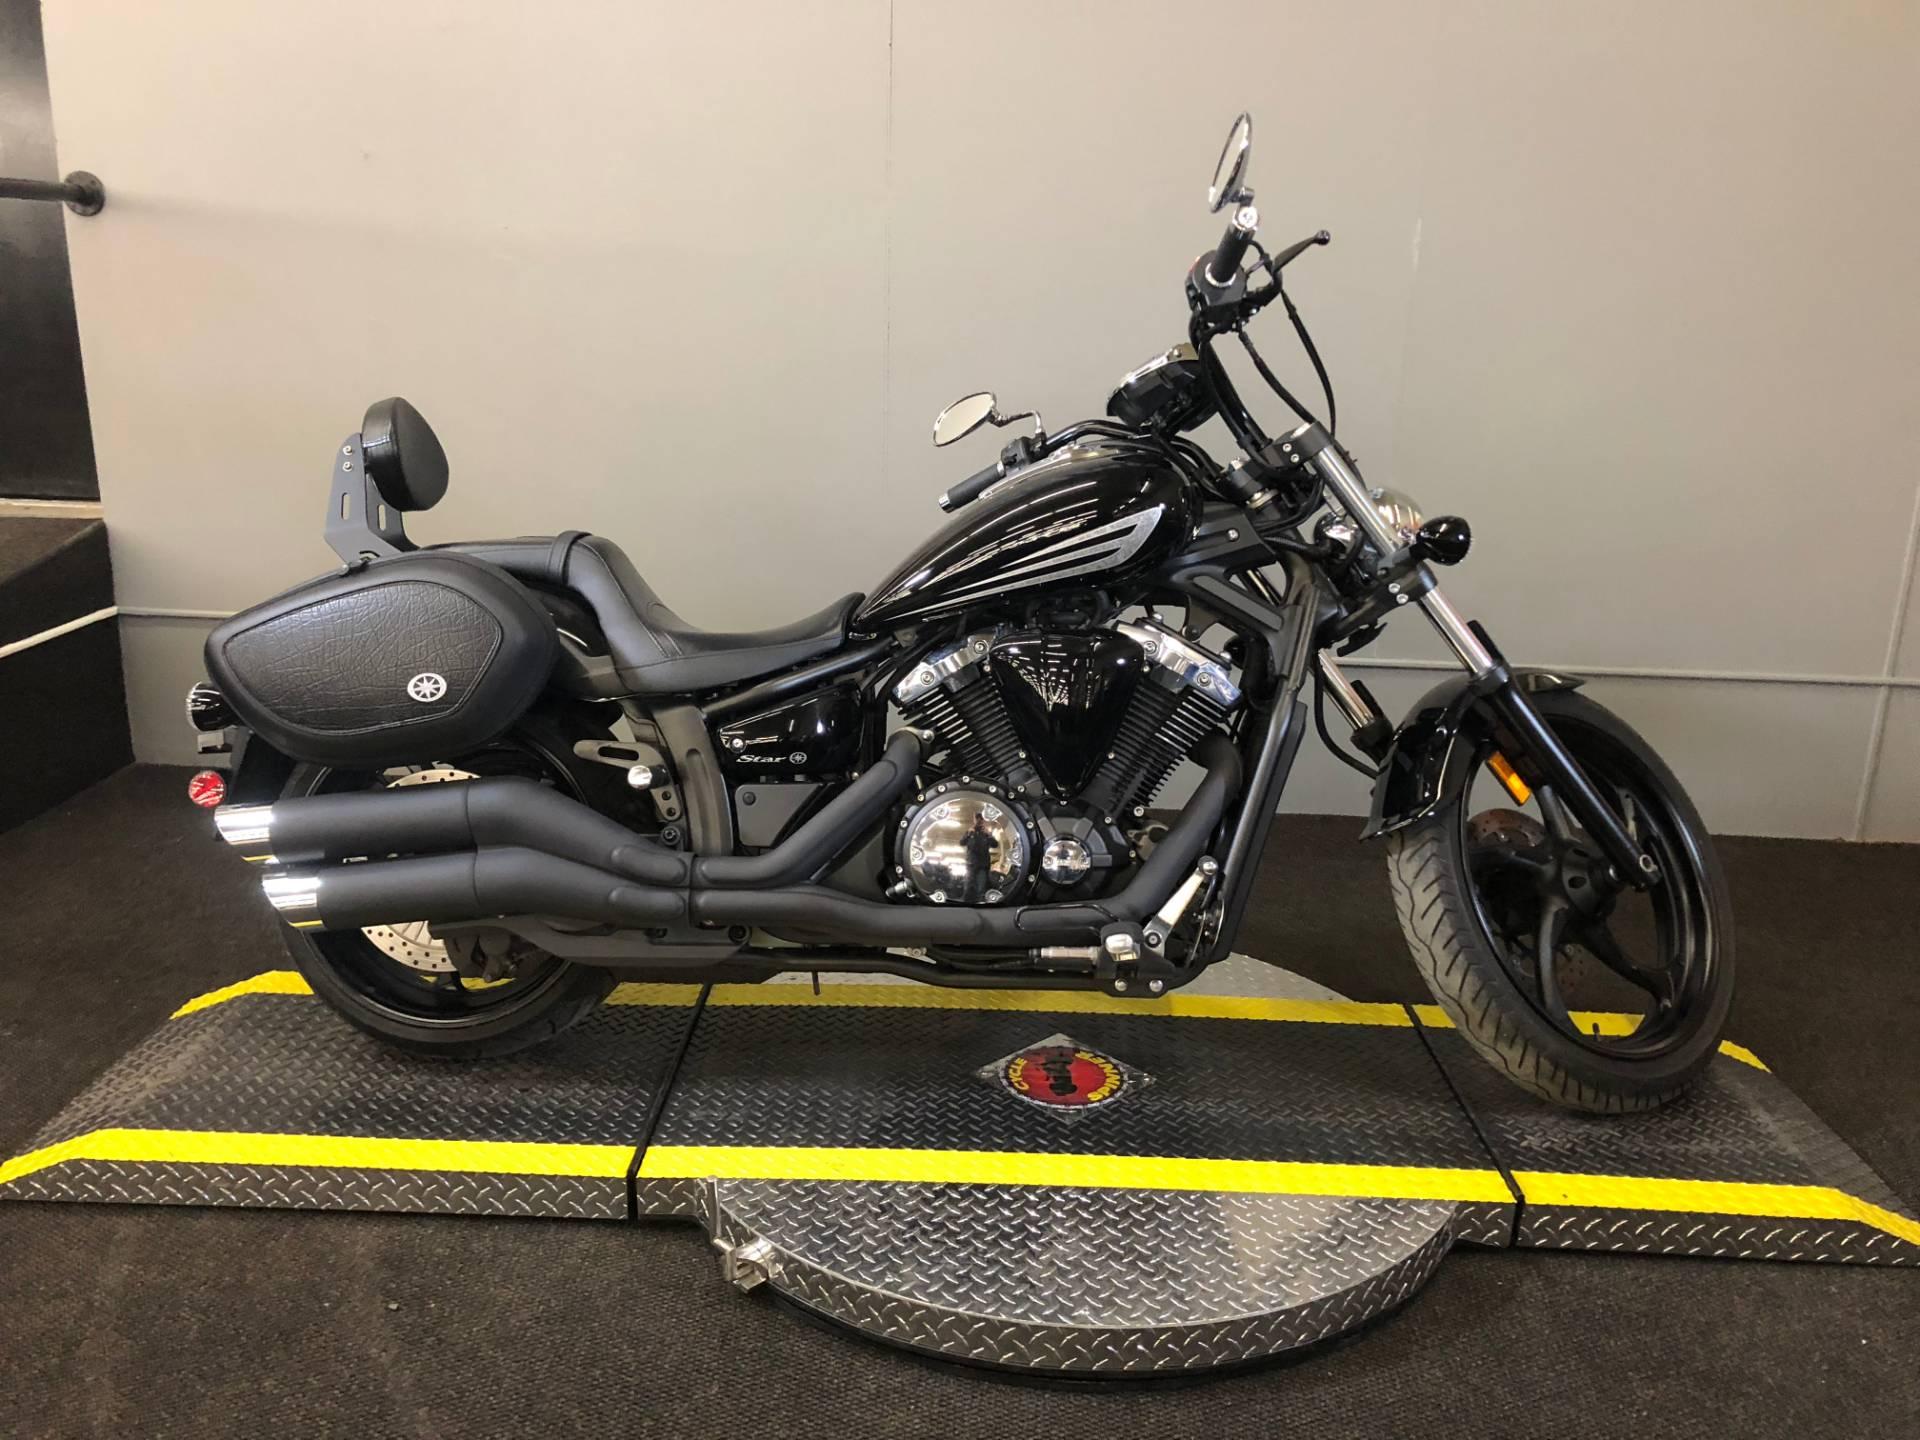 2011 Yamaha Stryker for sale 108477